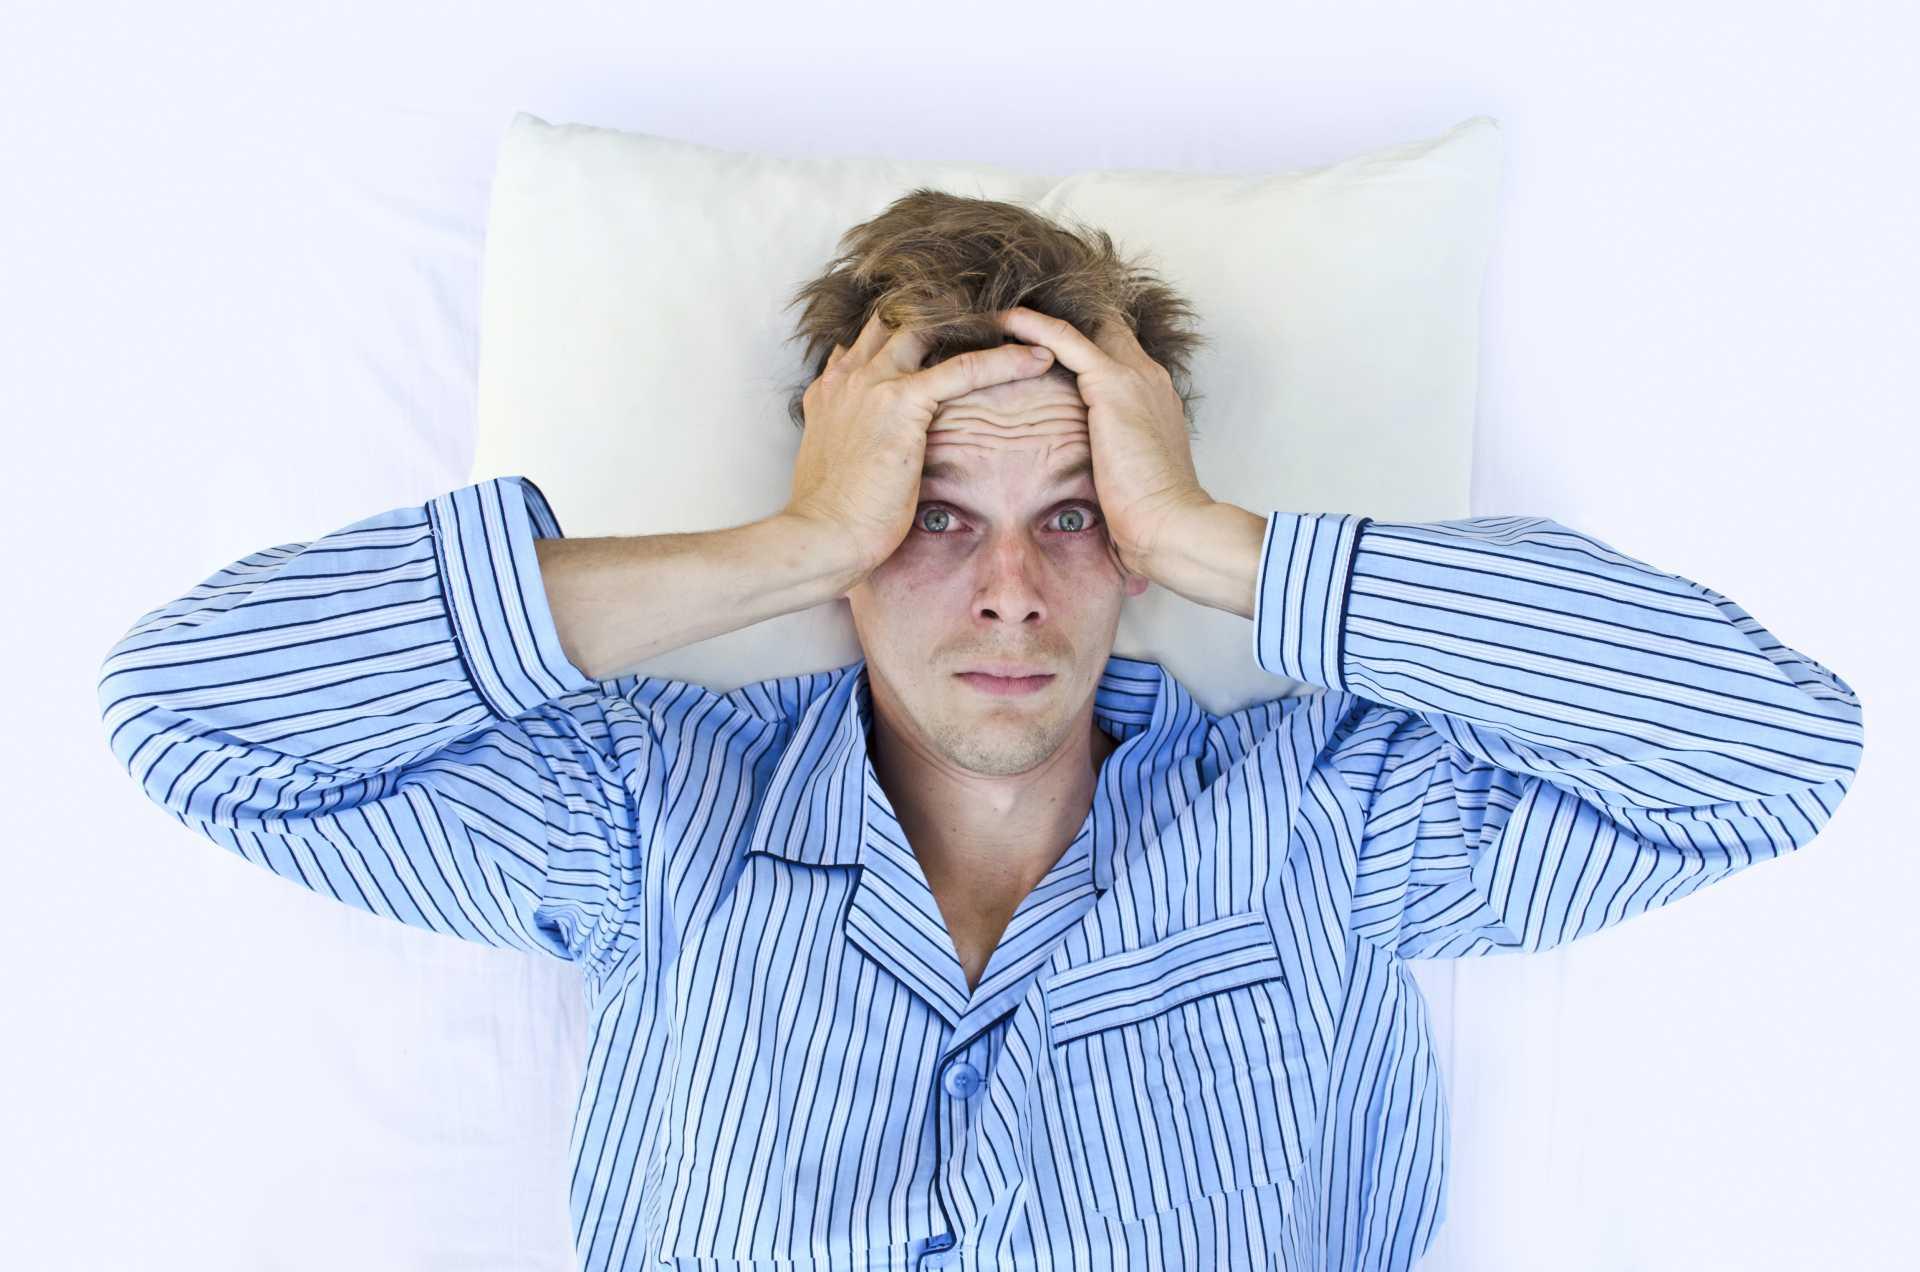 Como suspeitar de Apneia do Sono